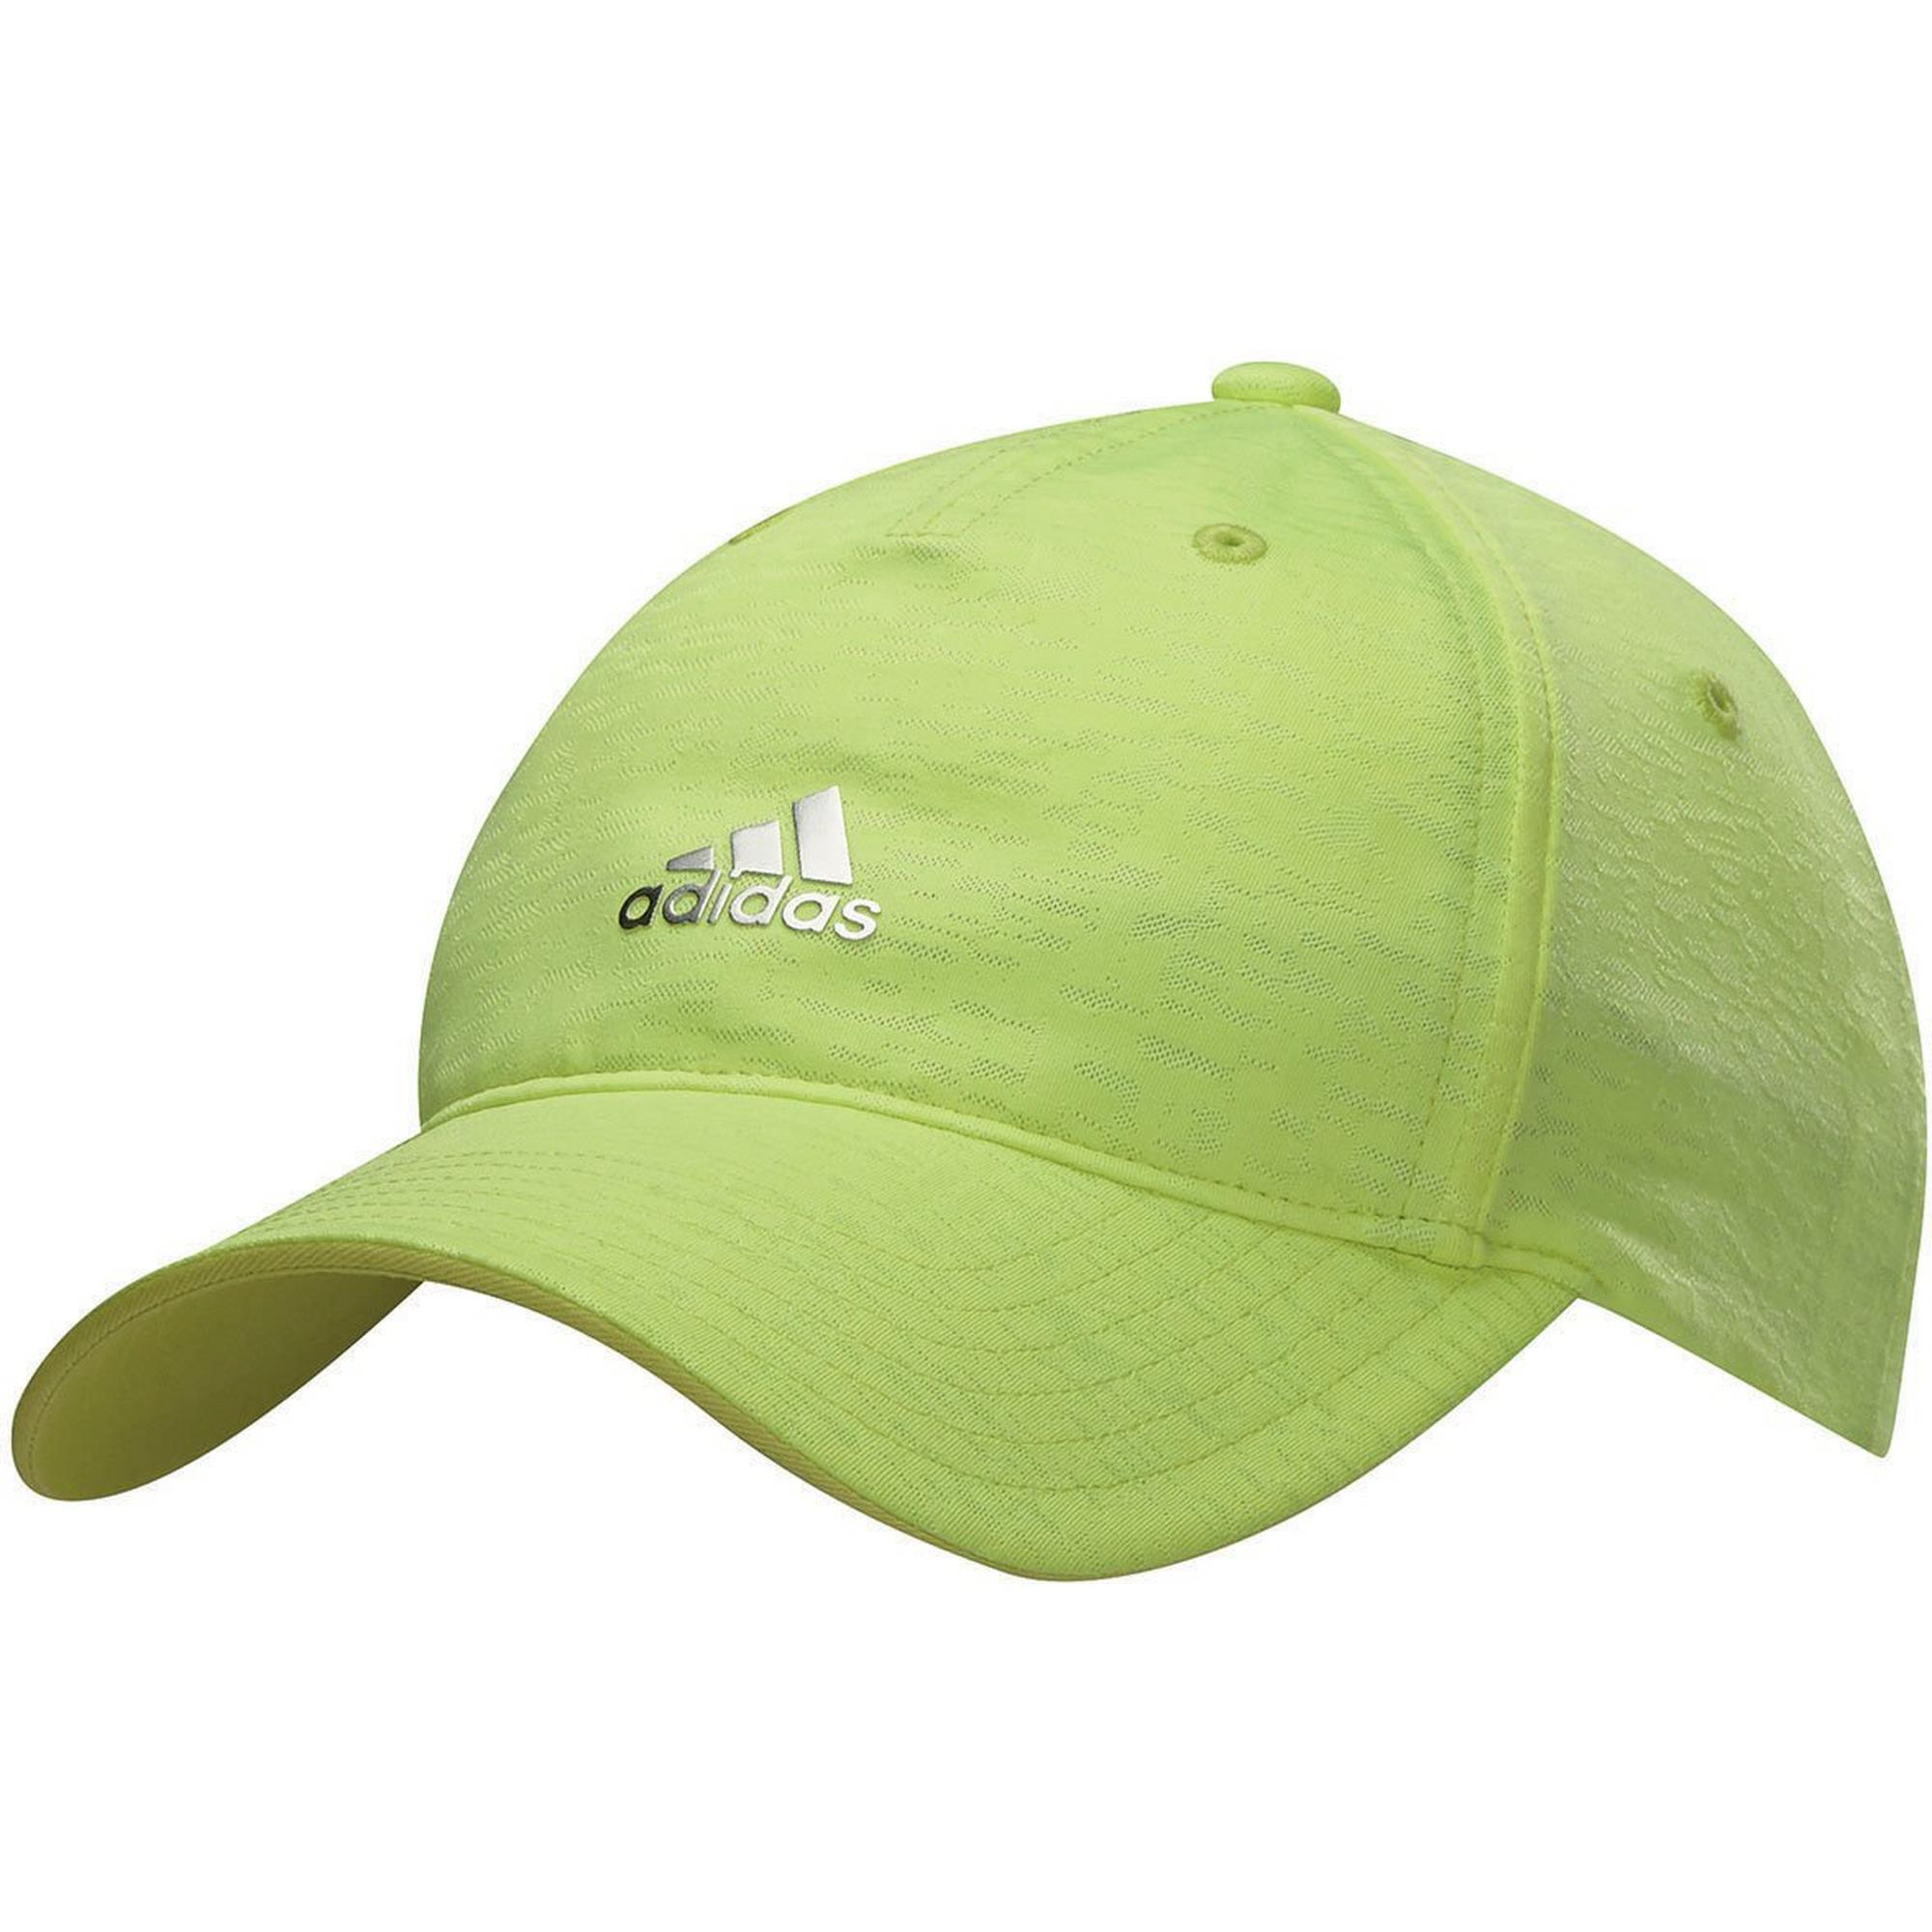 Women's Jacquard Novelty Hat